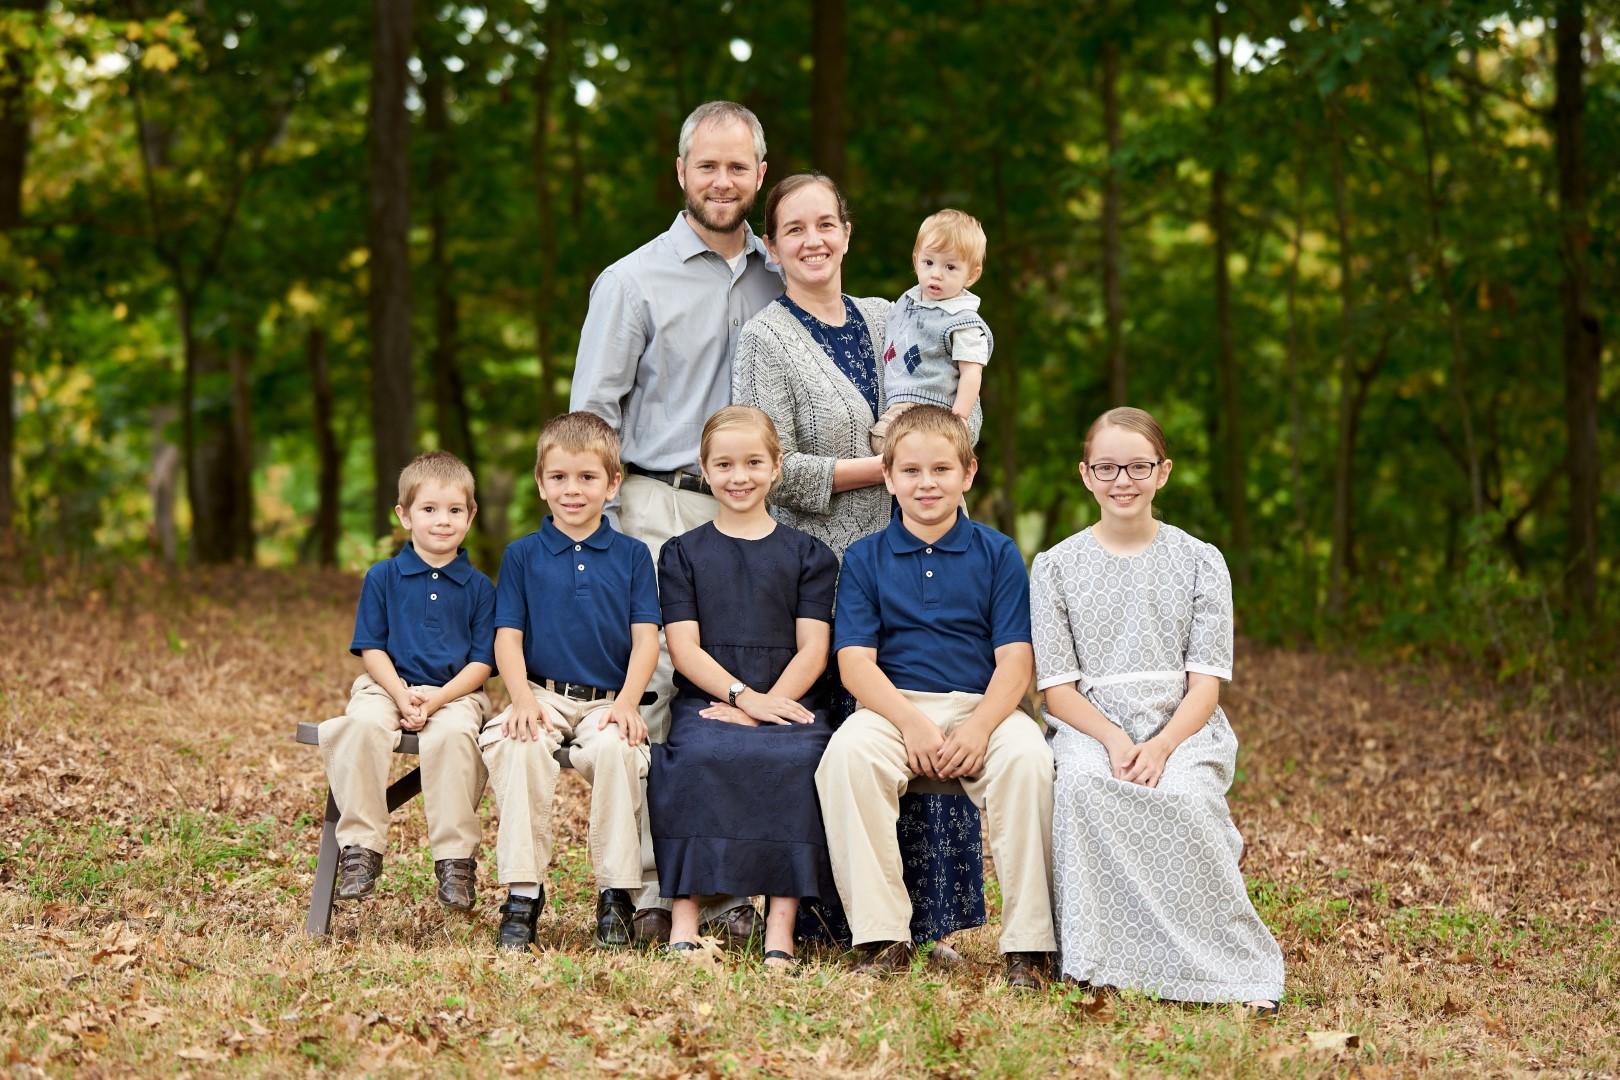 The B.M. Good Family